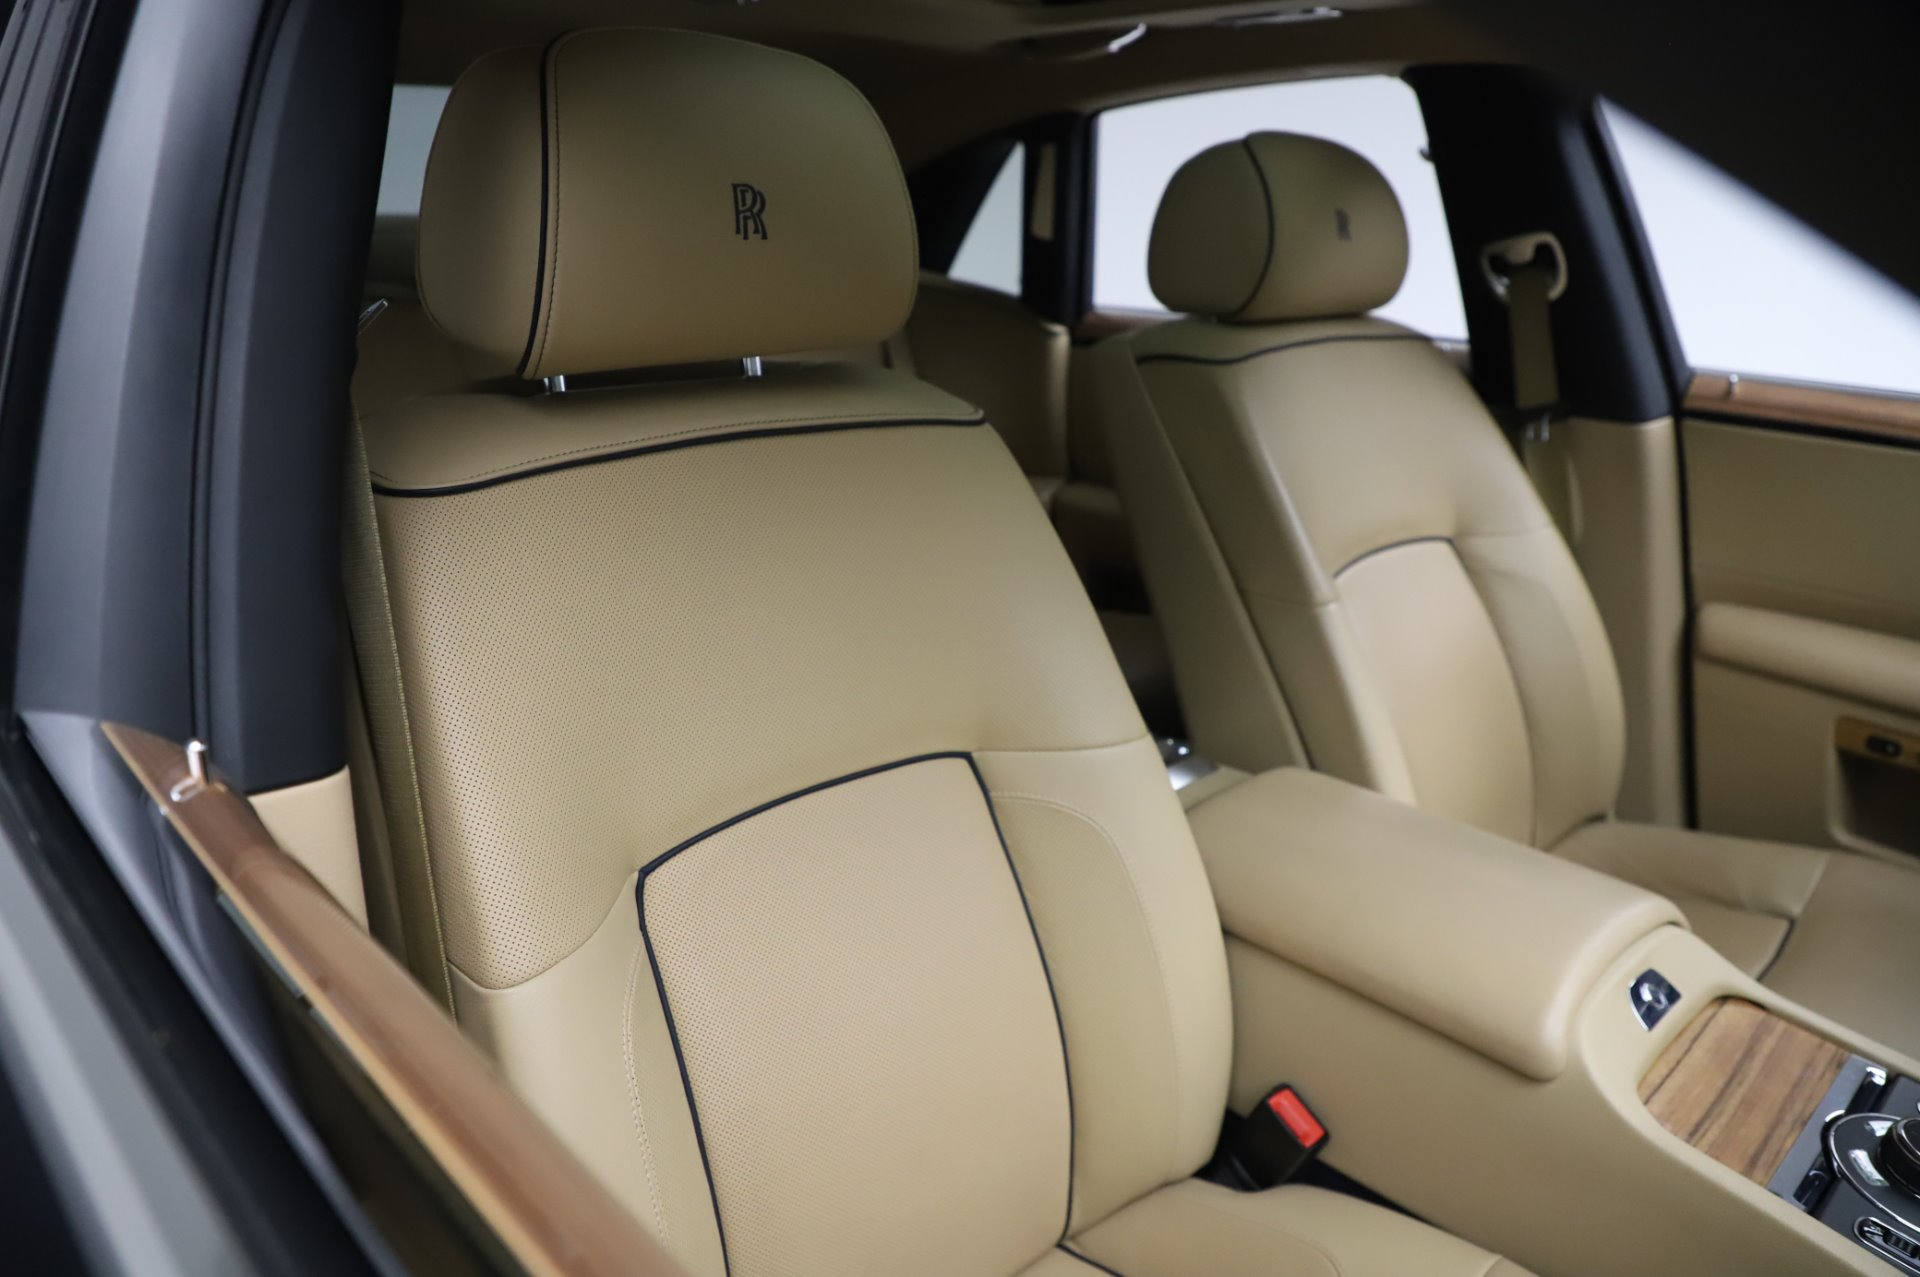 Used 2014 Rolls-Royce Ghost V-Spec For Sale In Westport, CT 858_p10